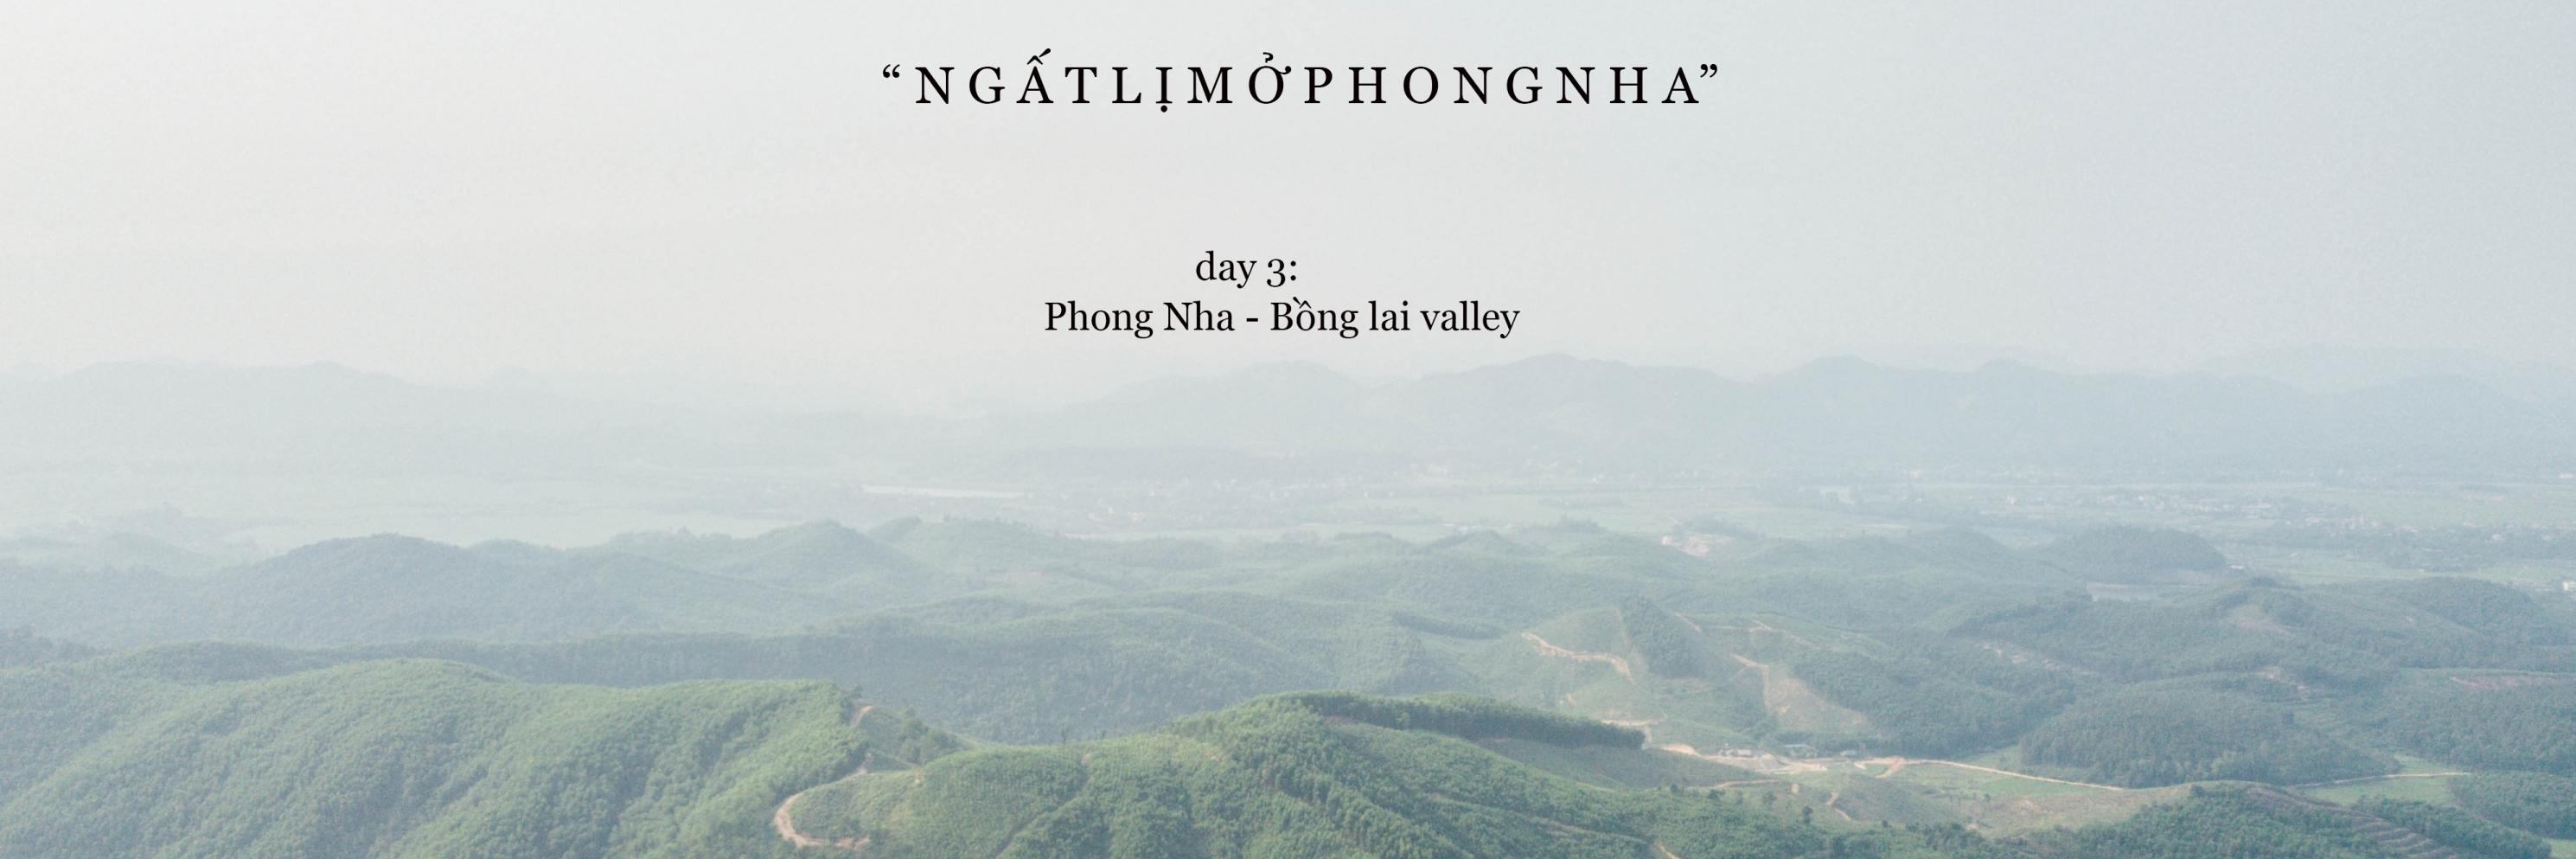 https://gody.vn/blog/22300925039814516928/post/xuyen-viet-cung-nguoi-la-quang-binh-3060